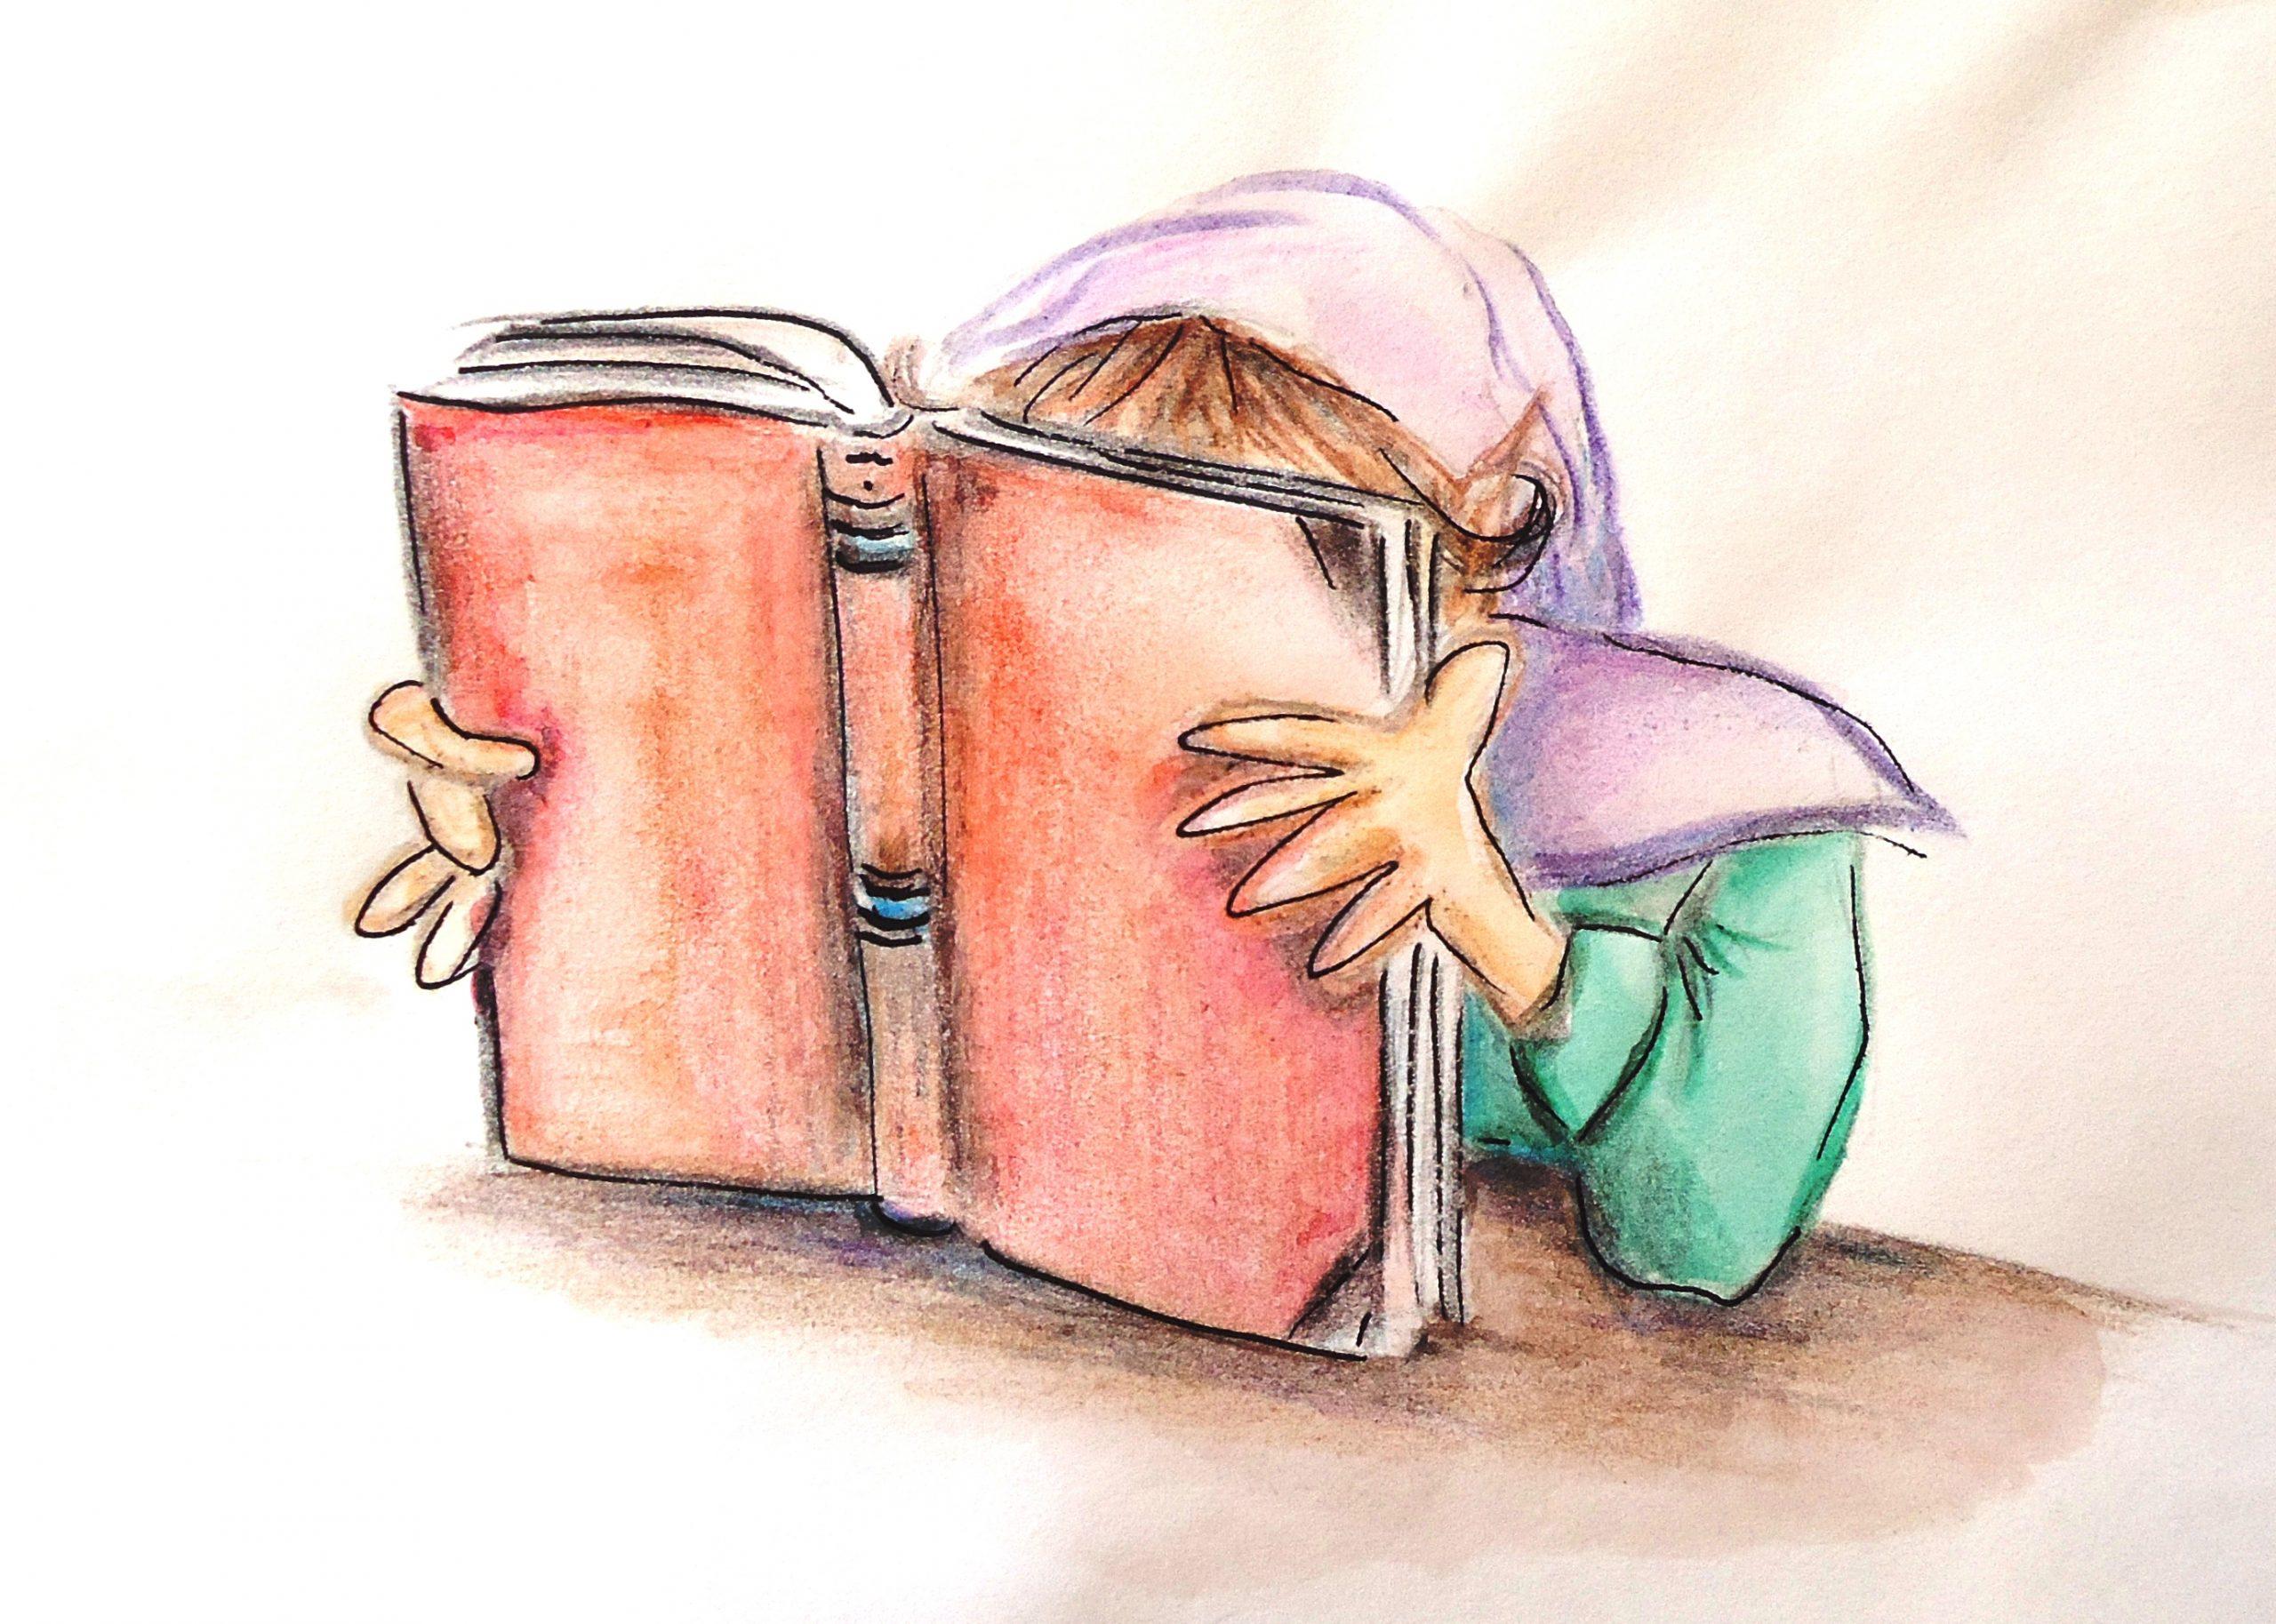 Jairo libro leyendo